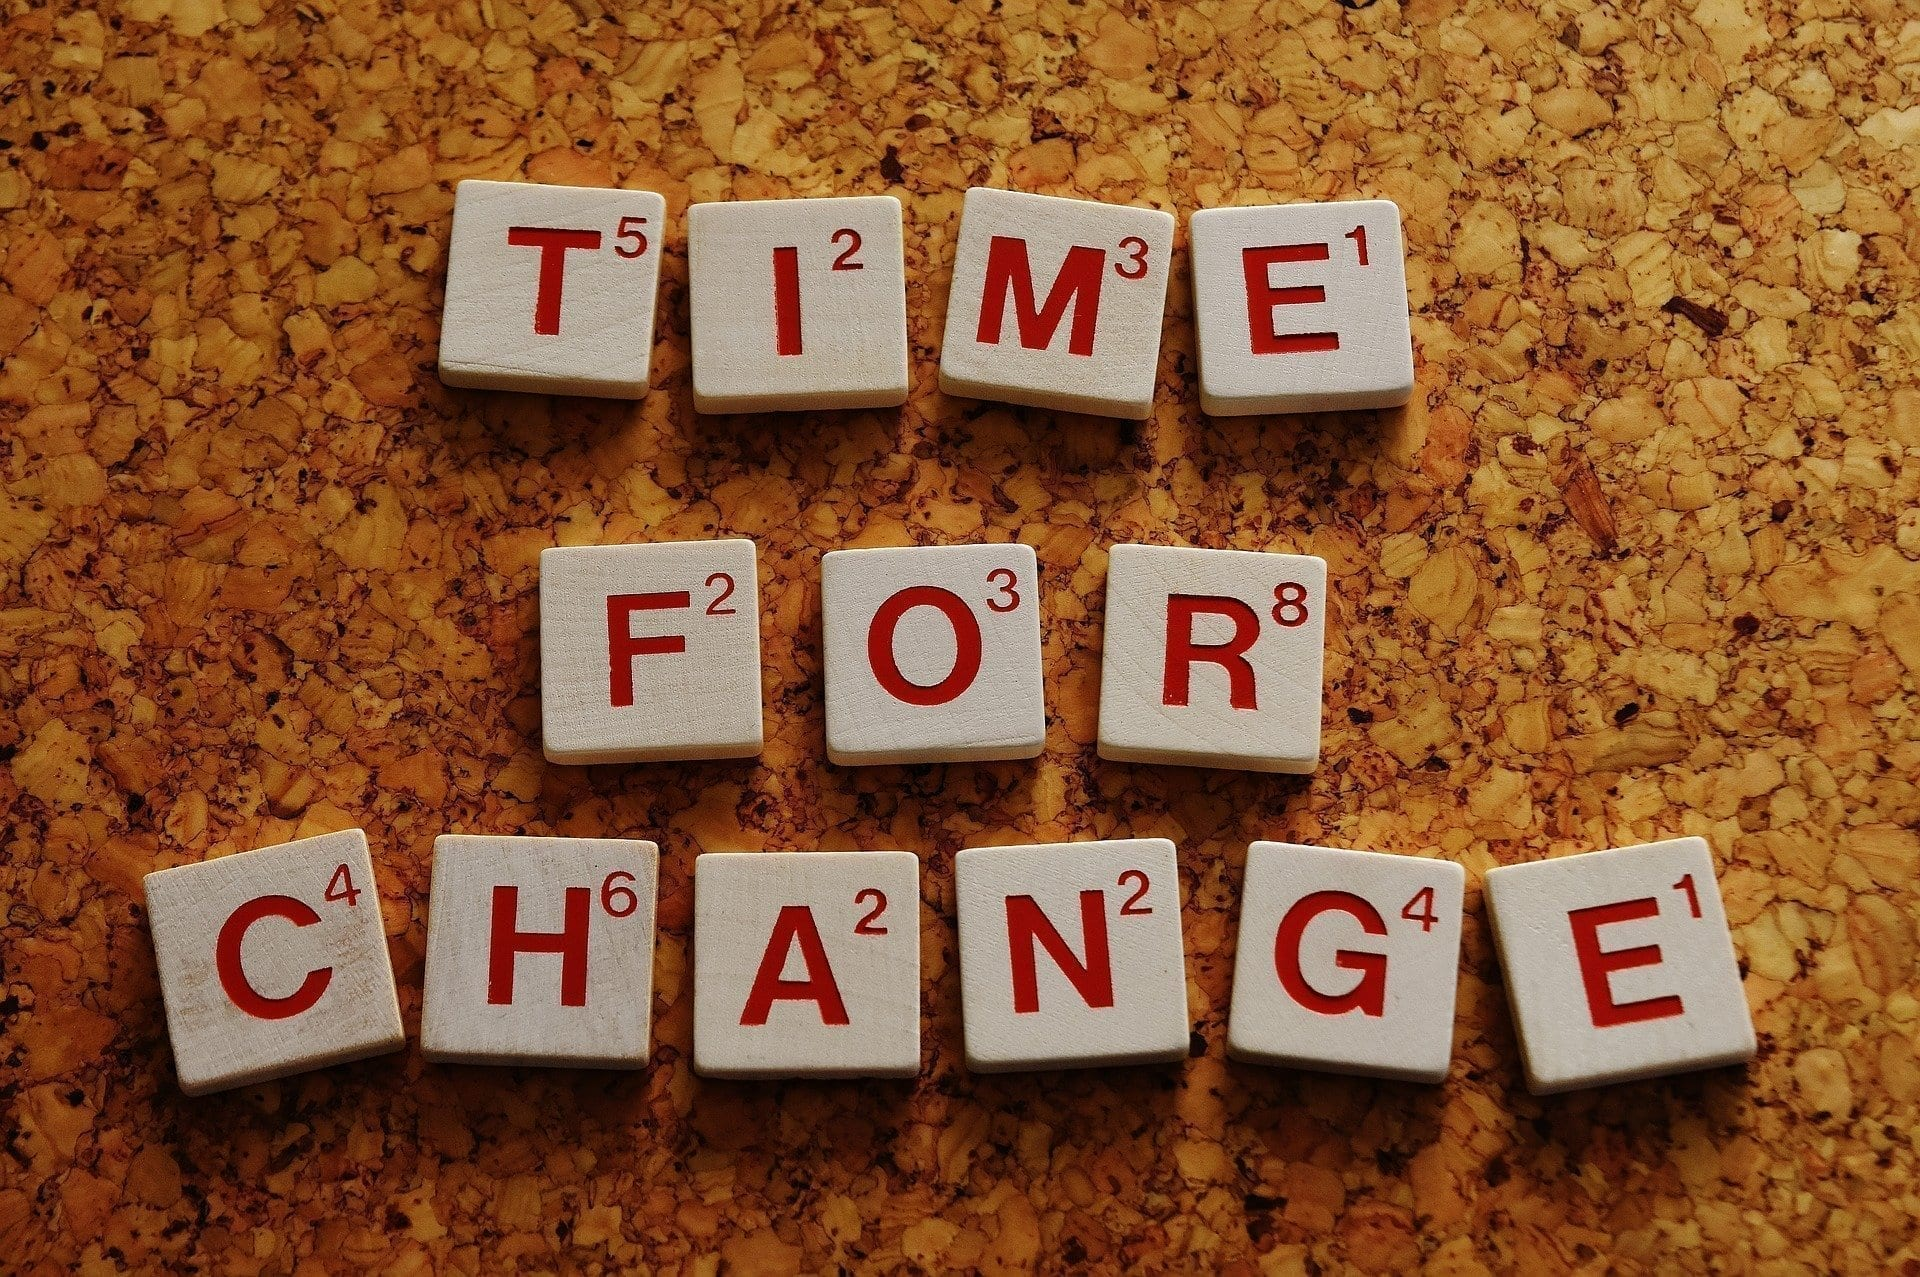 But real, fundamental change